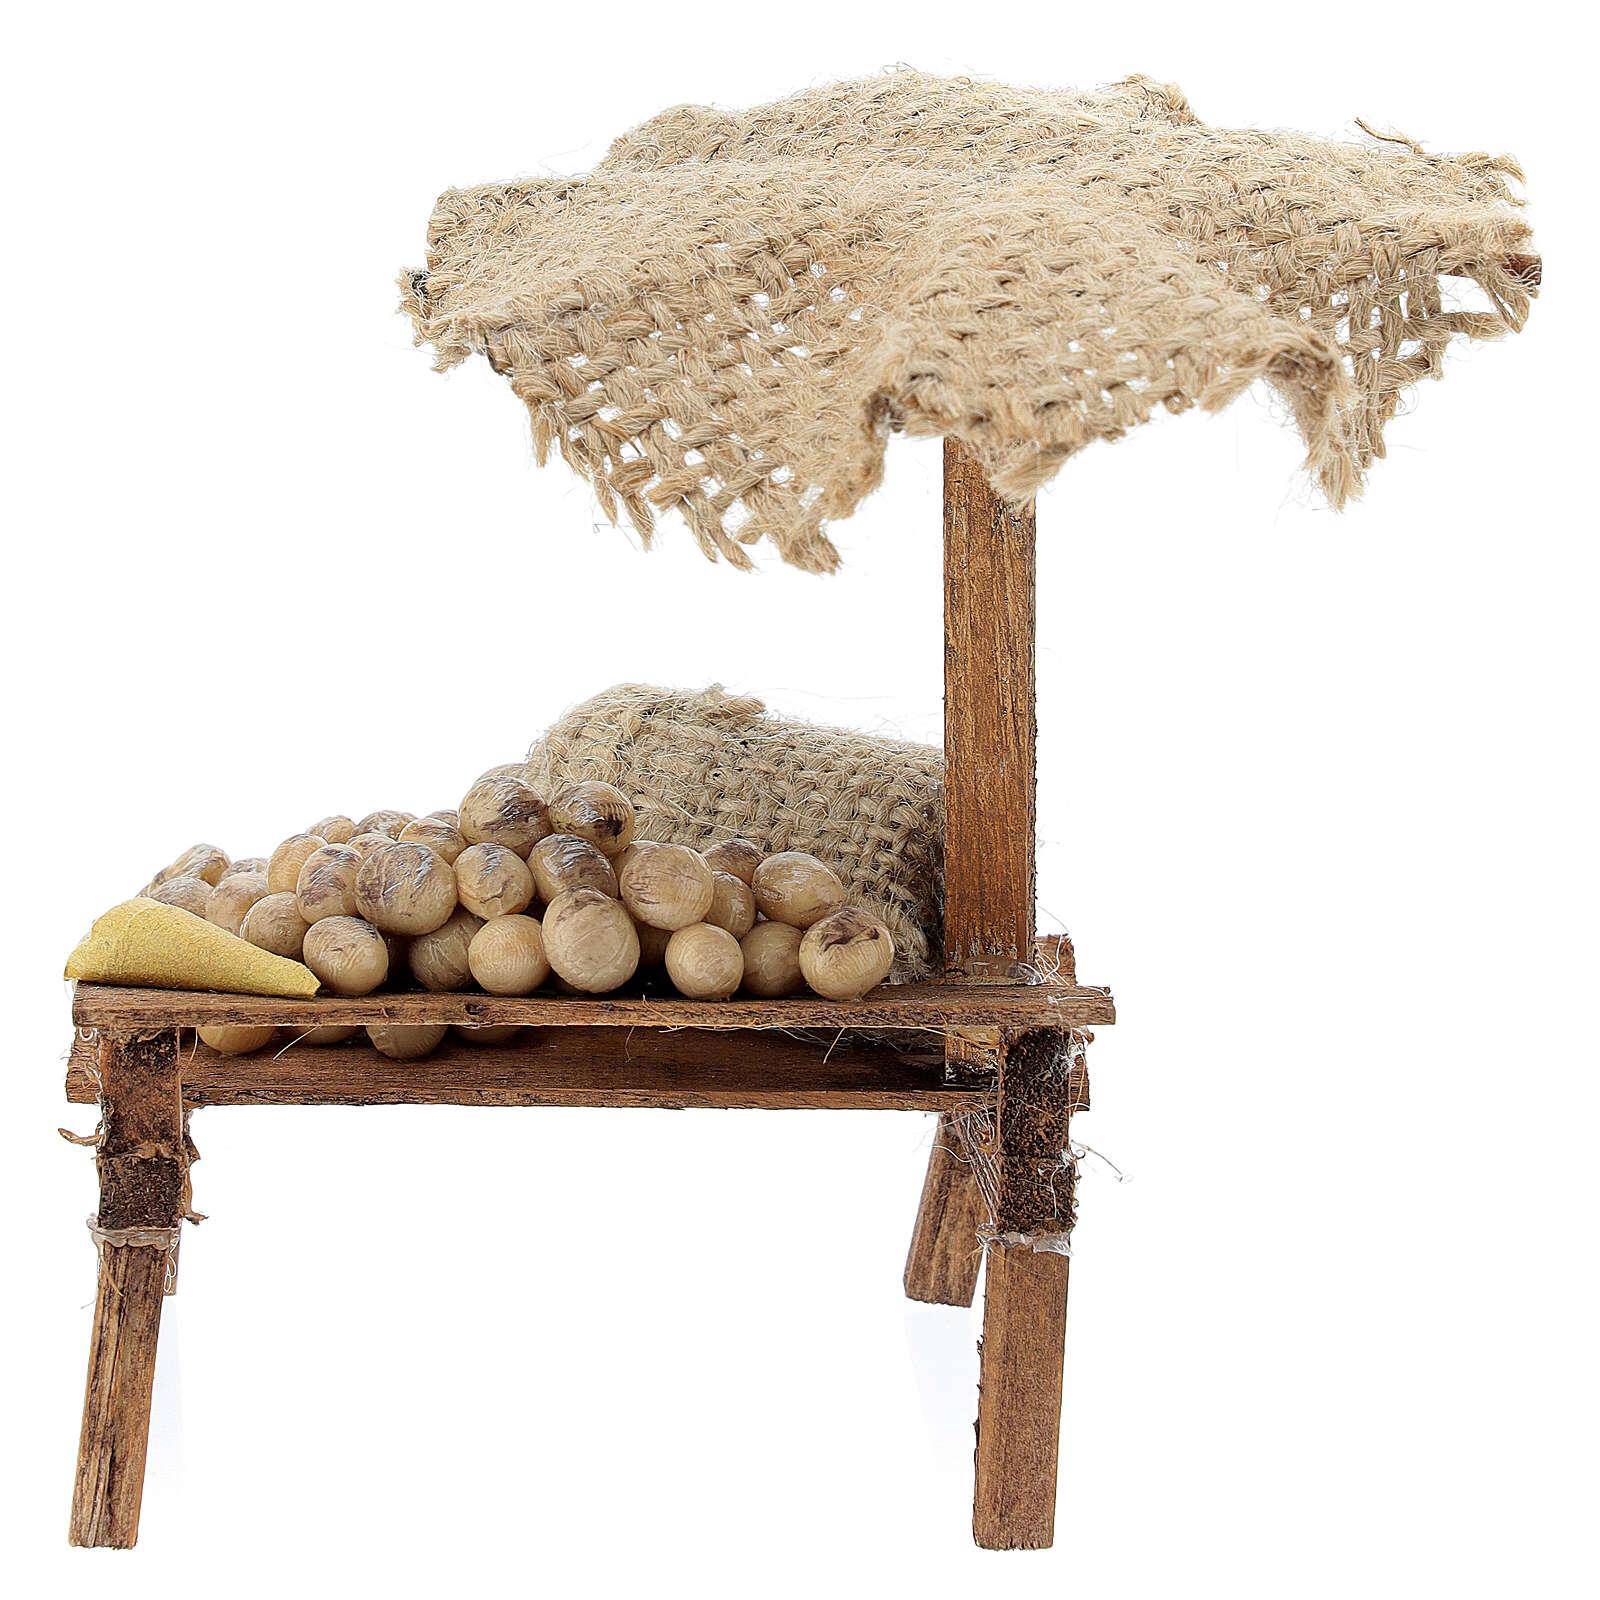 Nativity Bench with eggs and beach umbrella 12x10x12cm 4